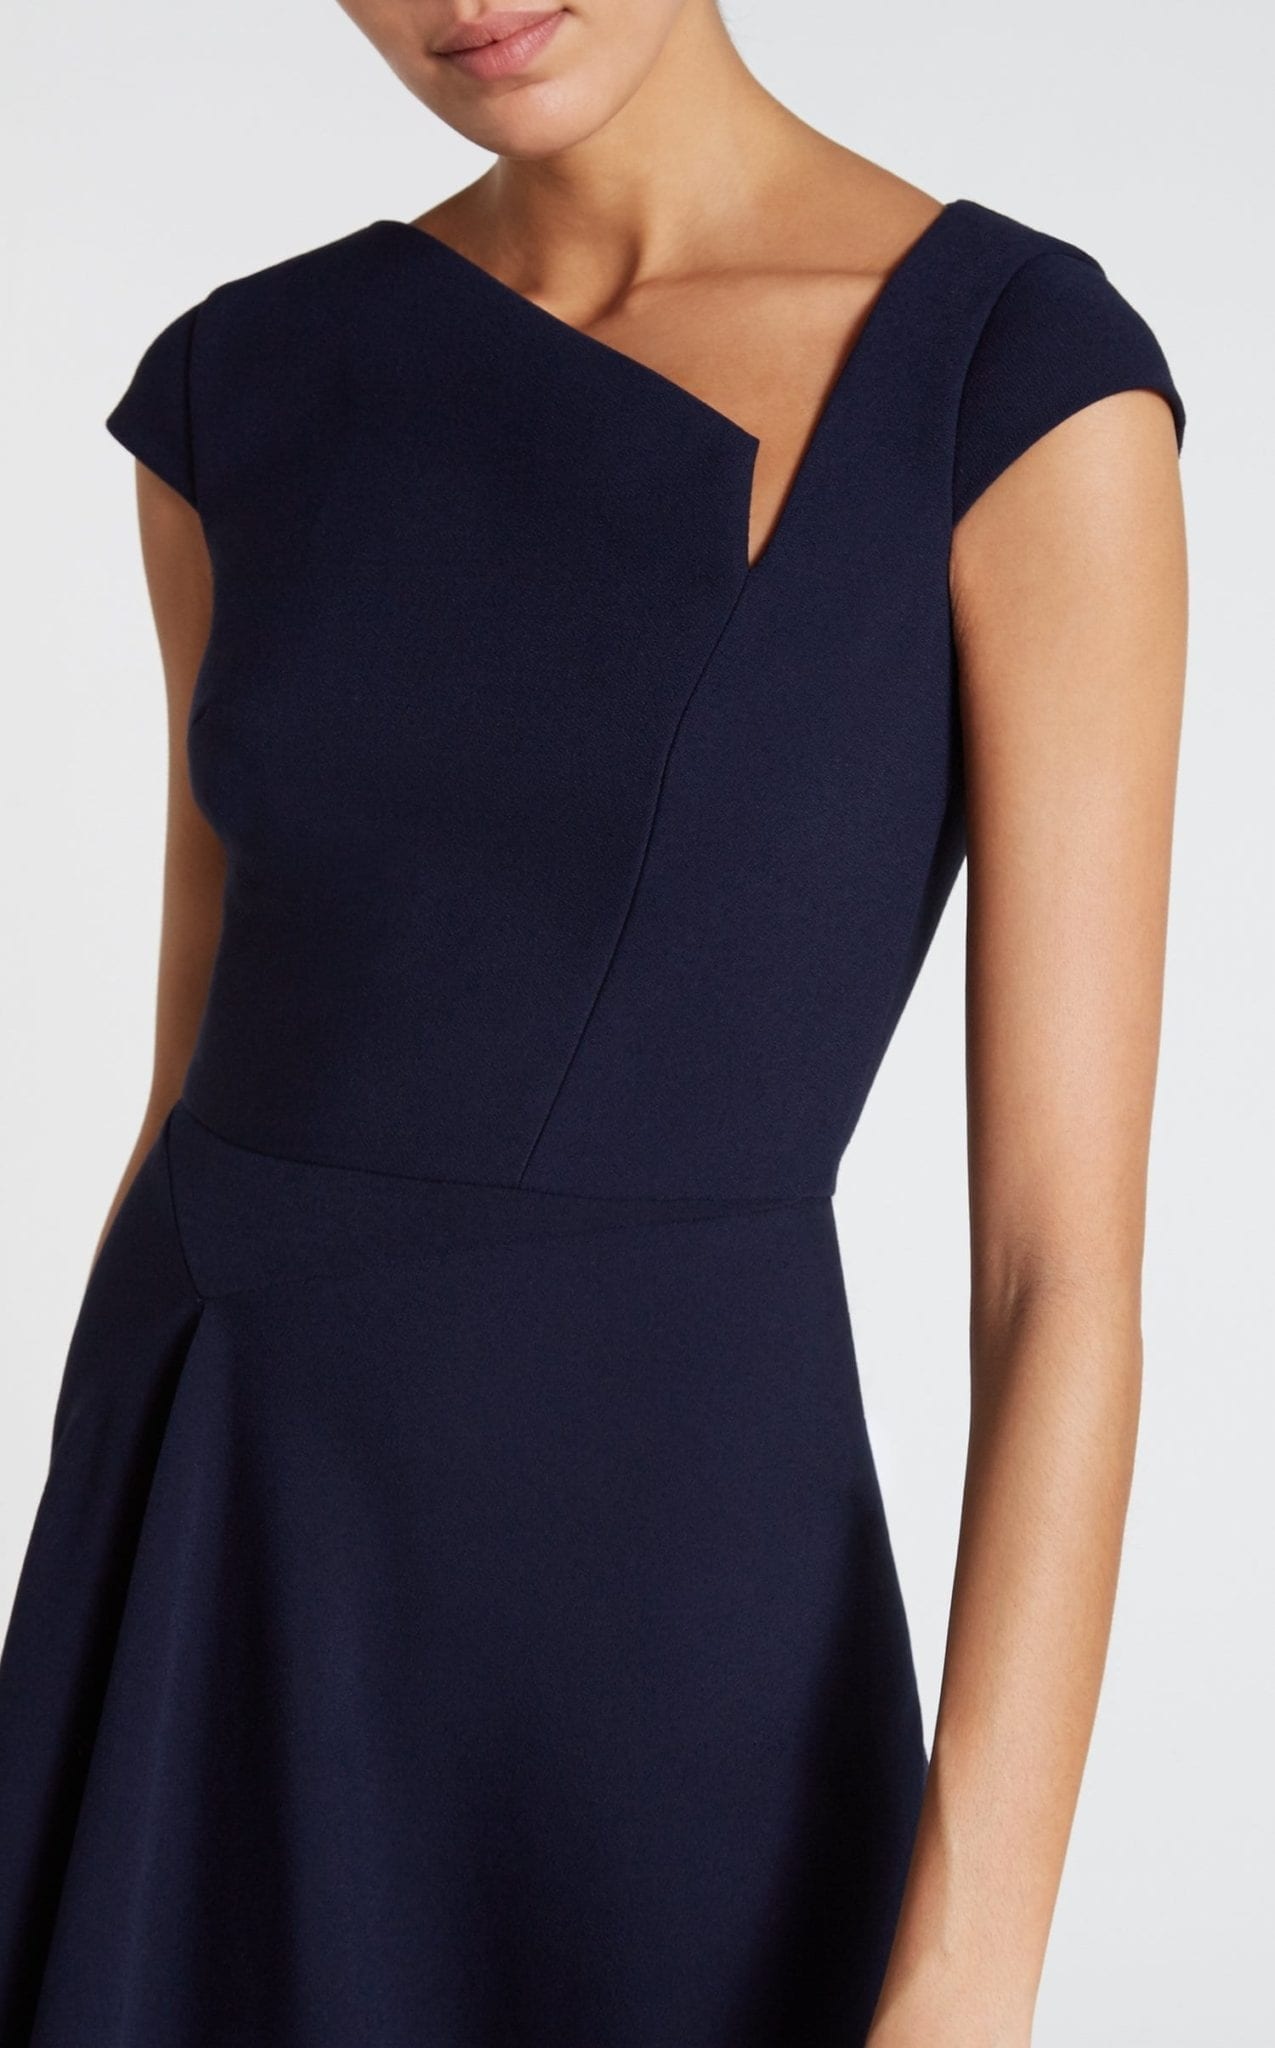 Roland Mouret Augustus Navy Dress We Select Dresses